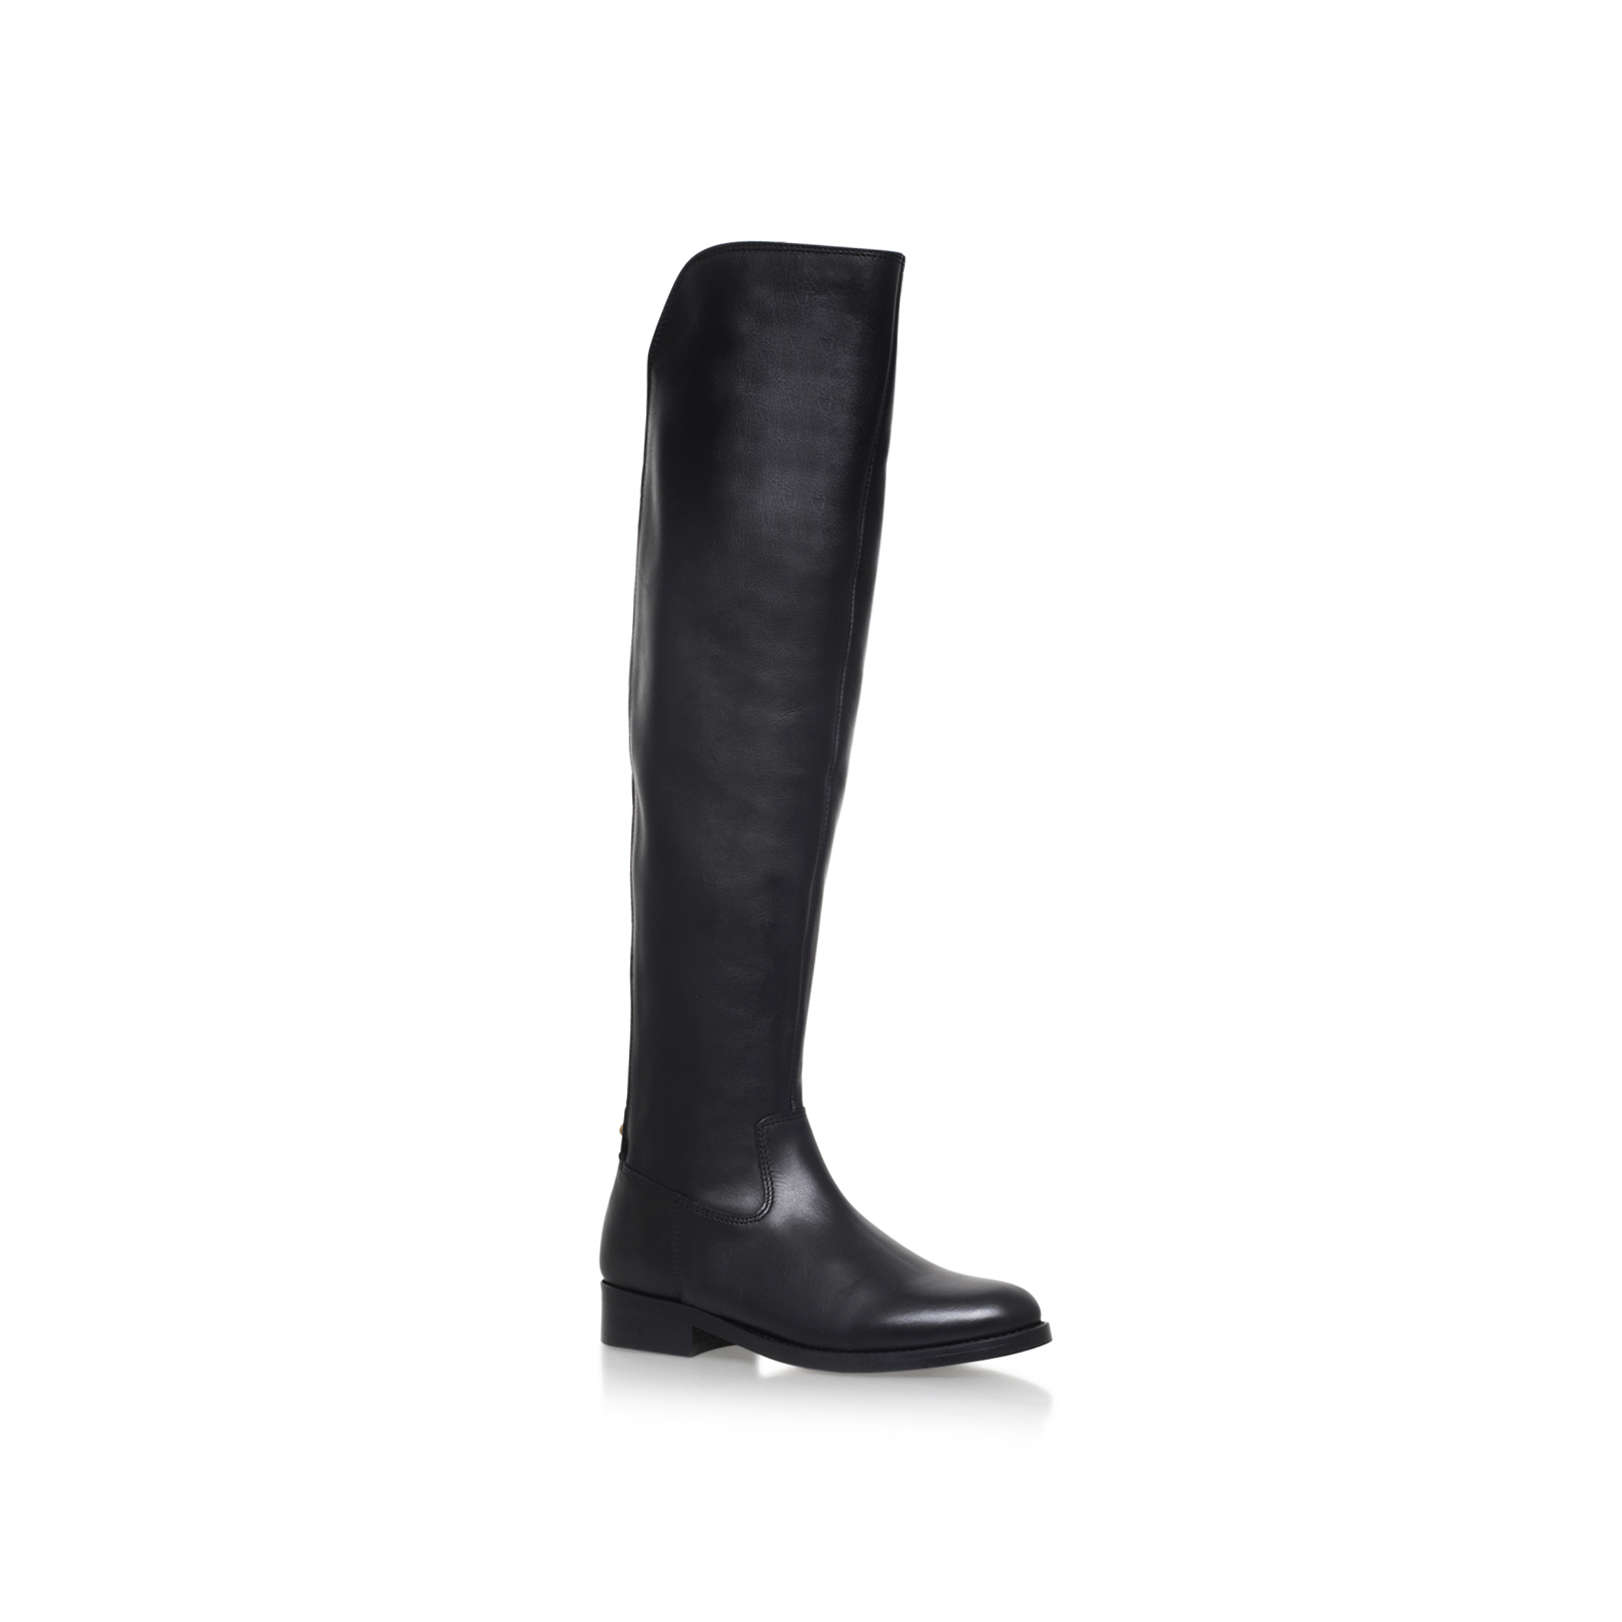 ... Knee High Boots /; varsity. VARSITY